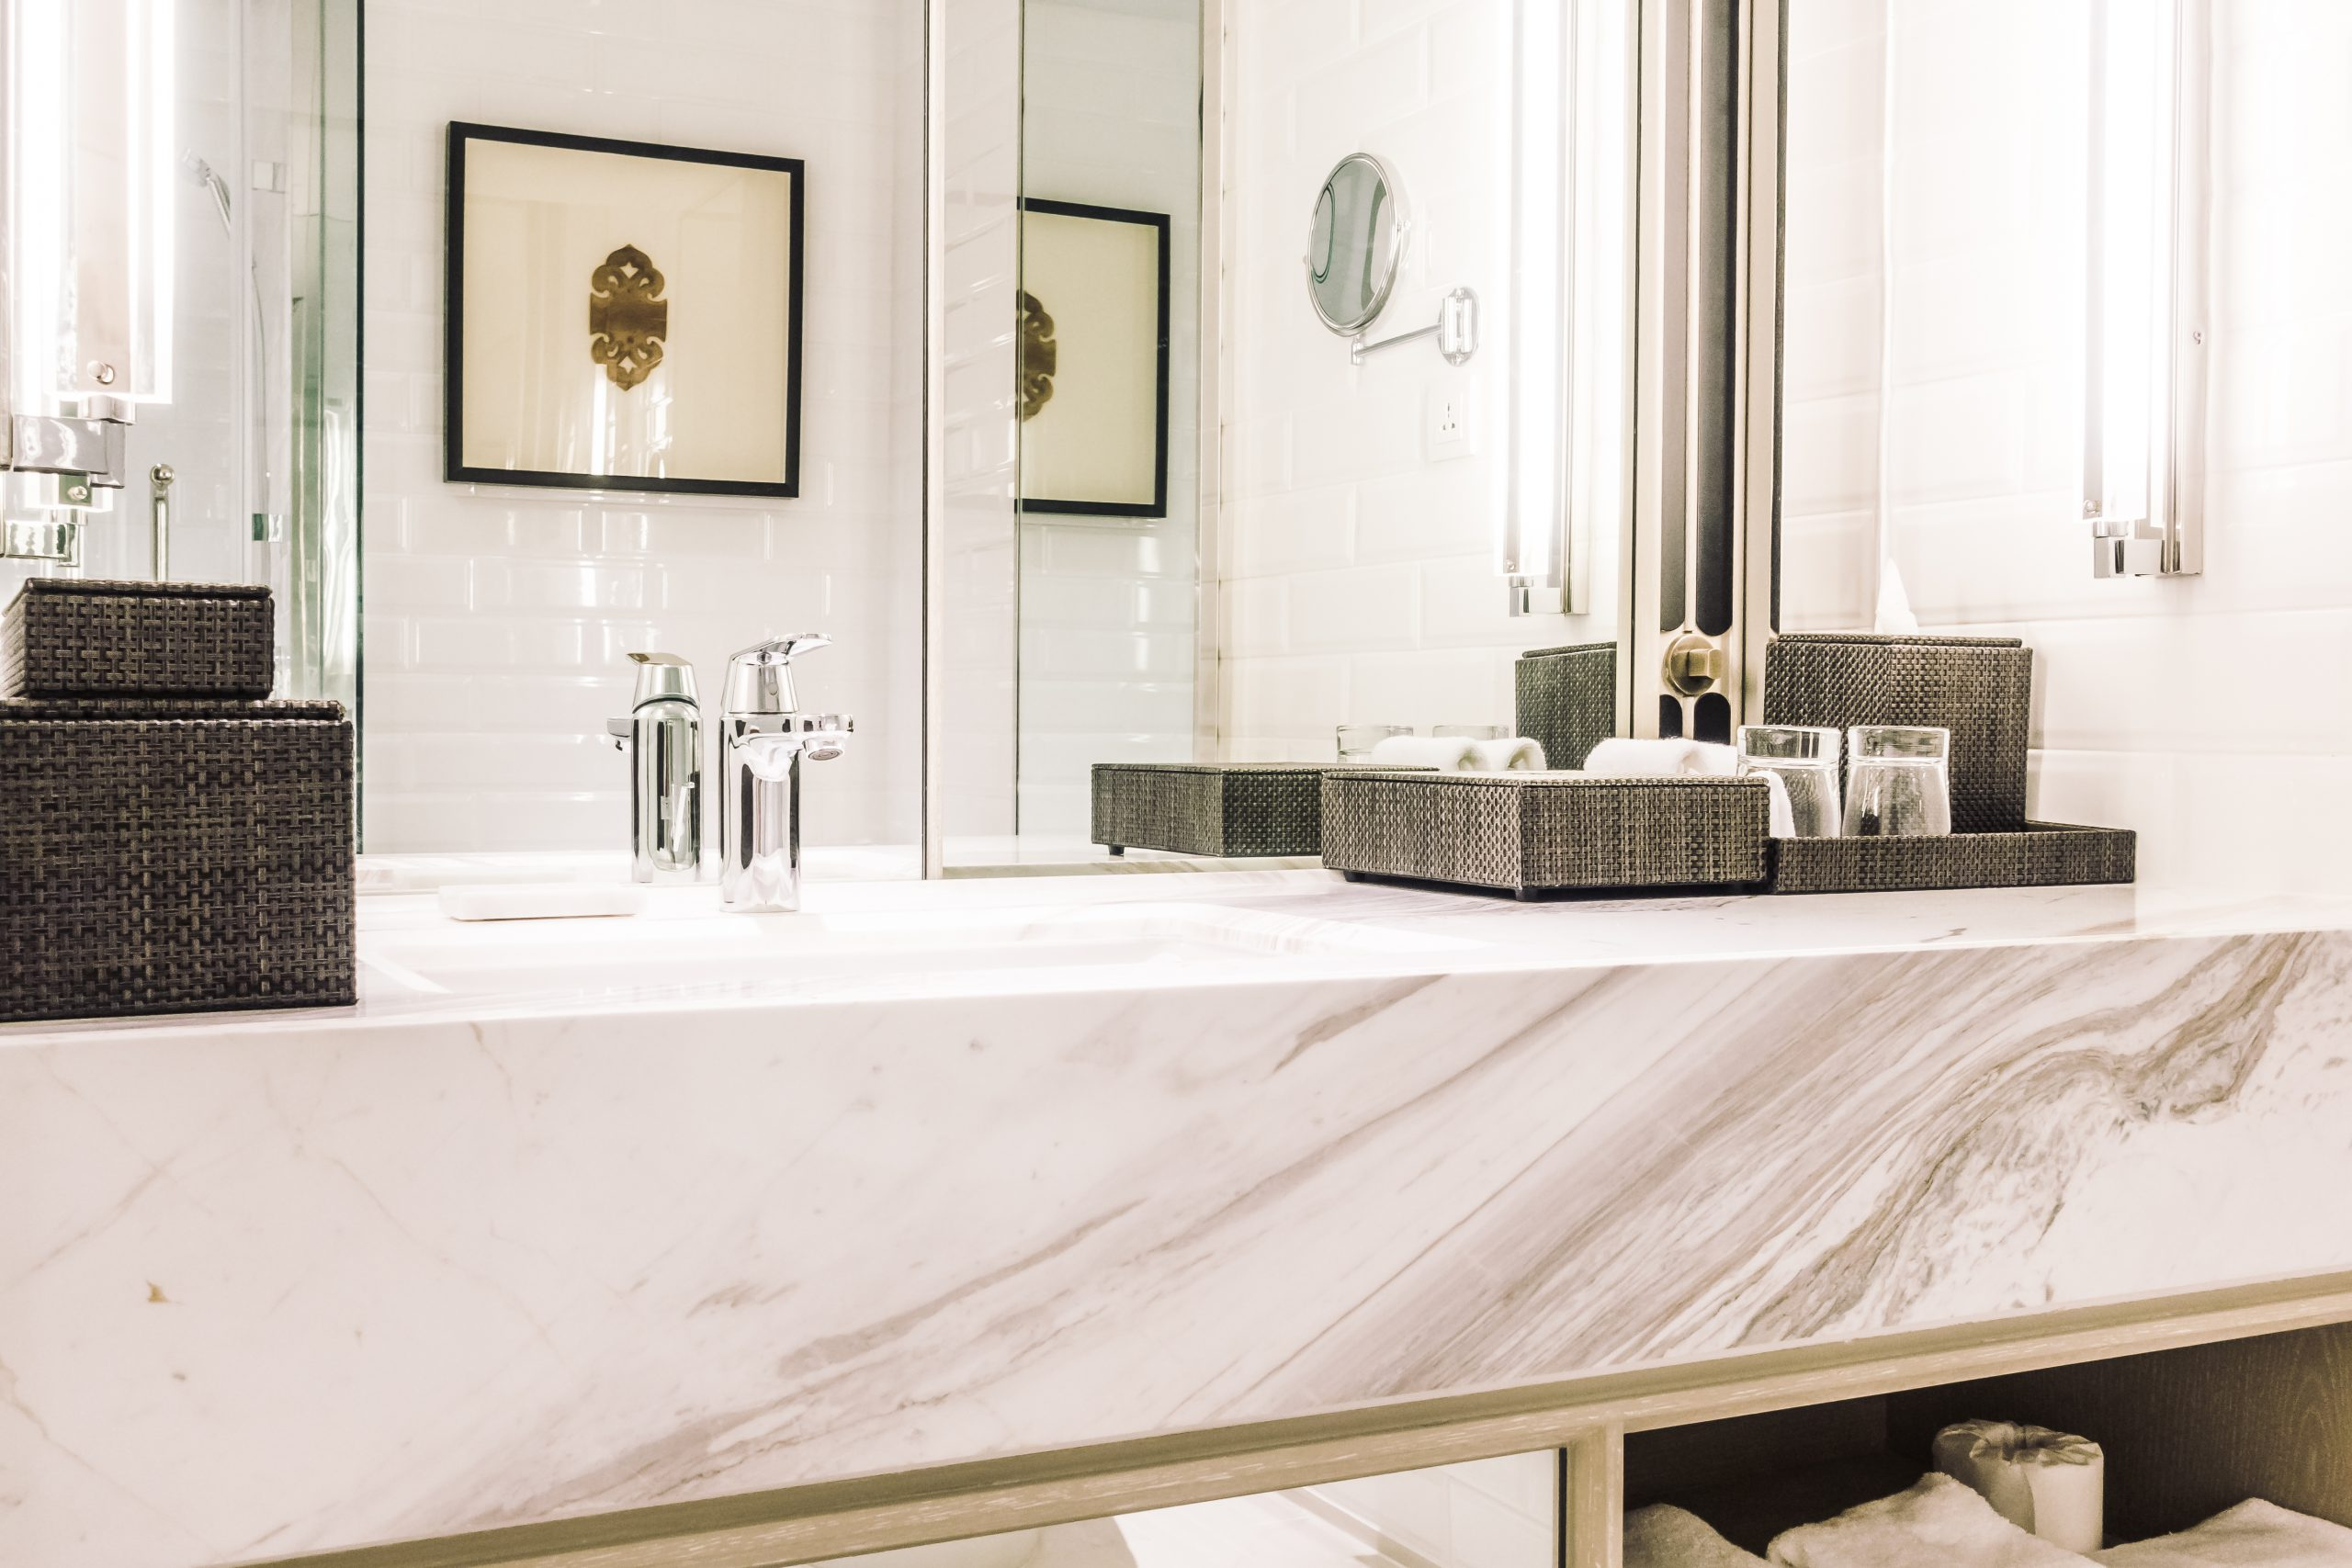 Beautiful luxury sink decoration in bathroom interior - Vintage Light Filter